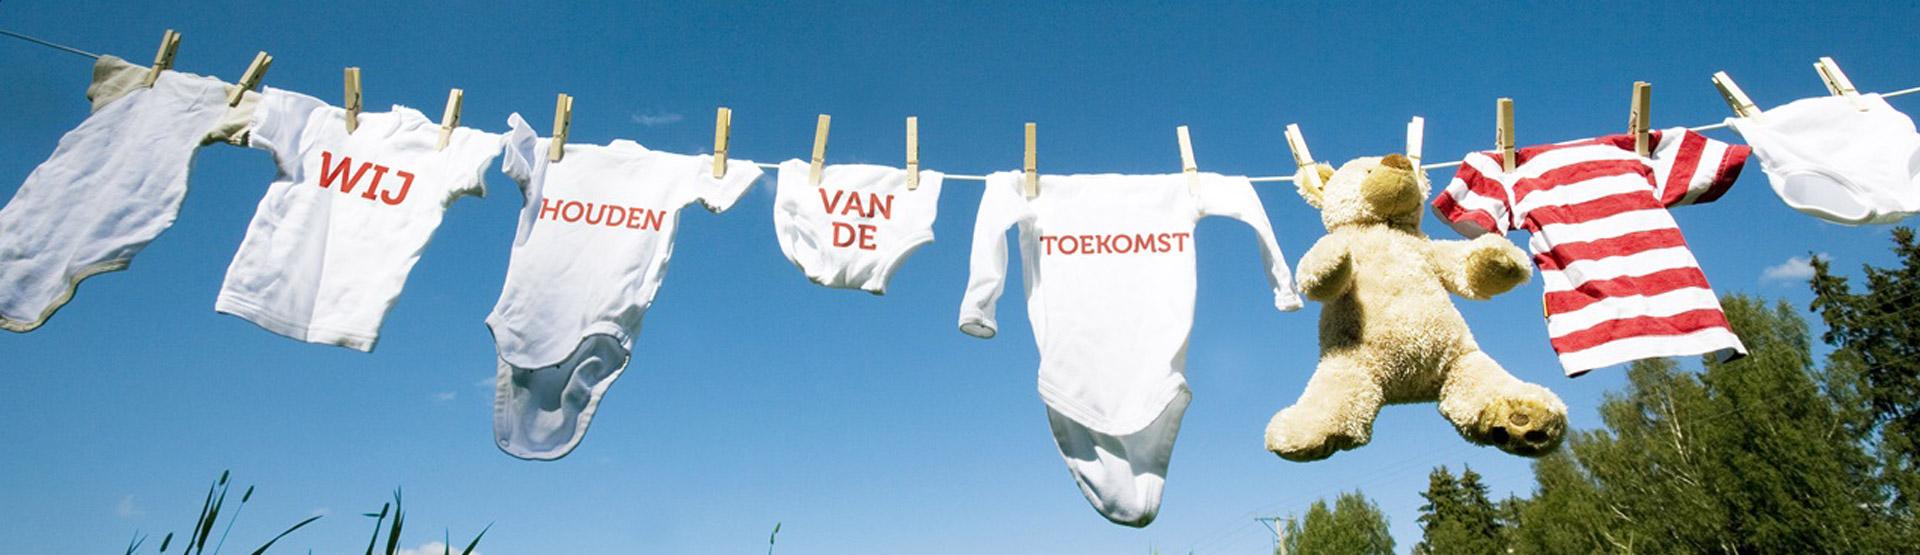 wasmachine, wasdroger, vaatwasser - huren of leasen - wasmachine huren